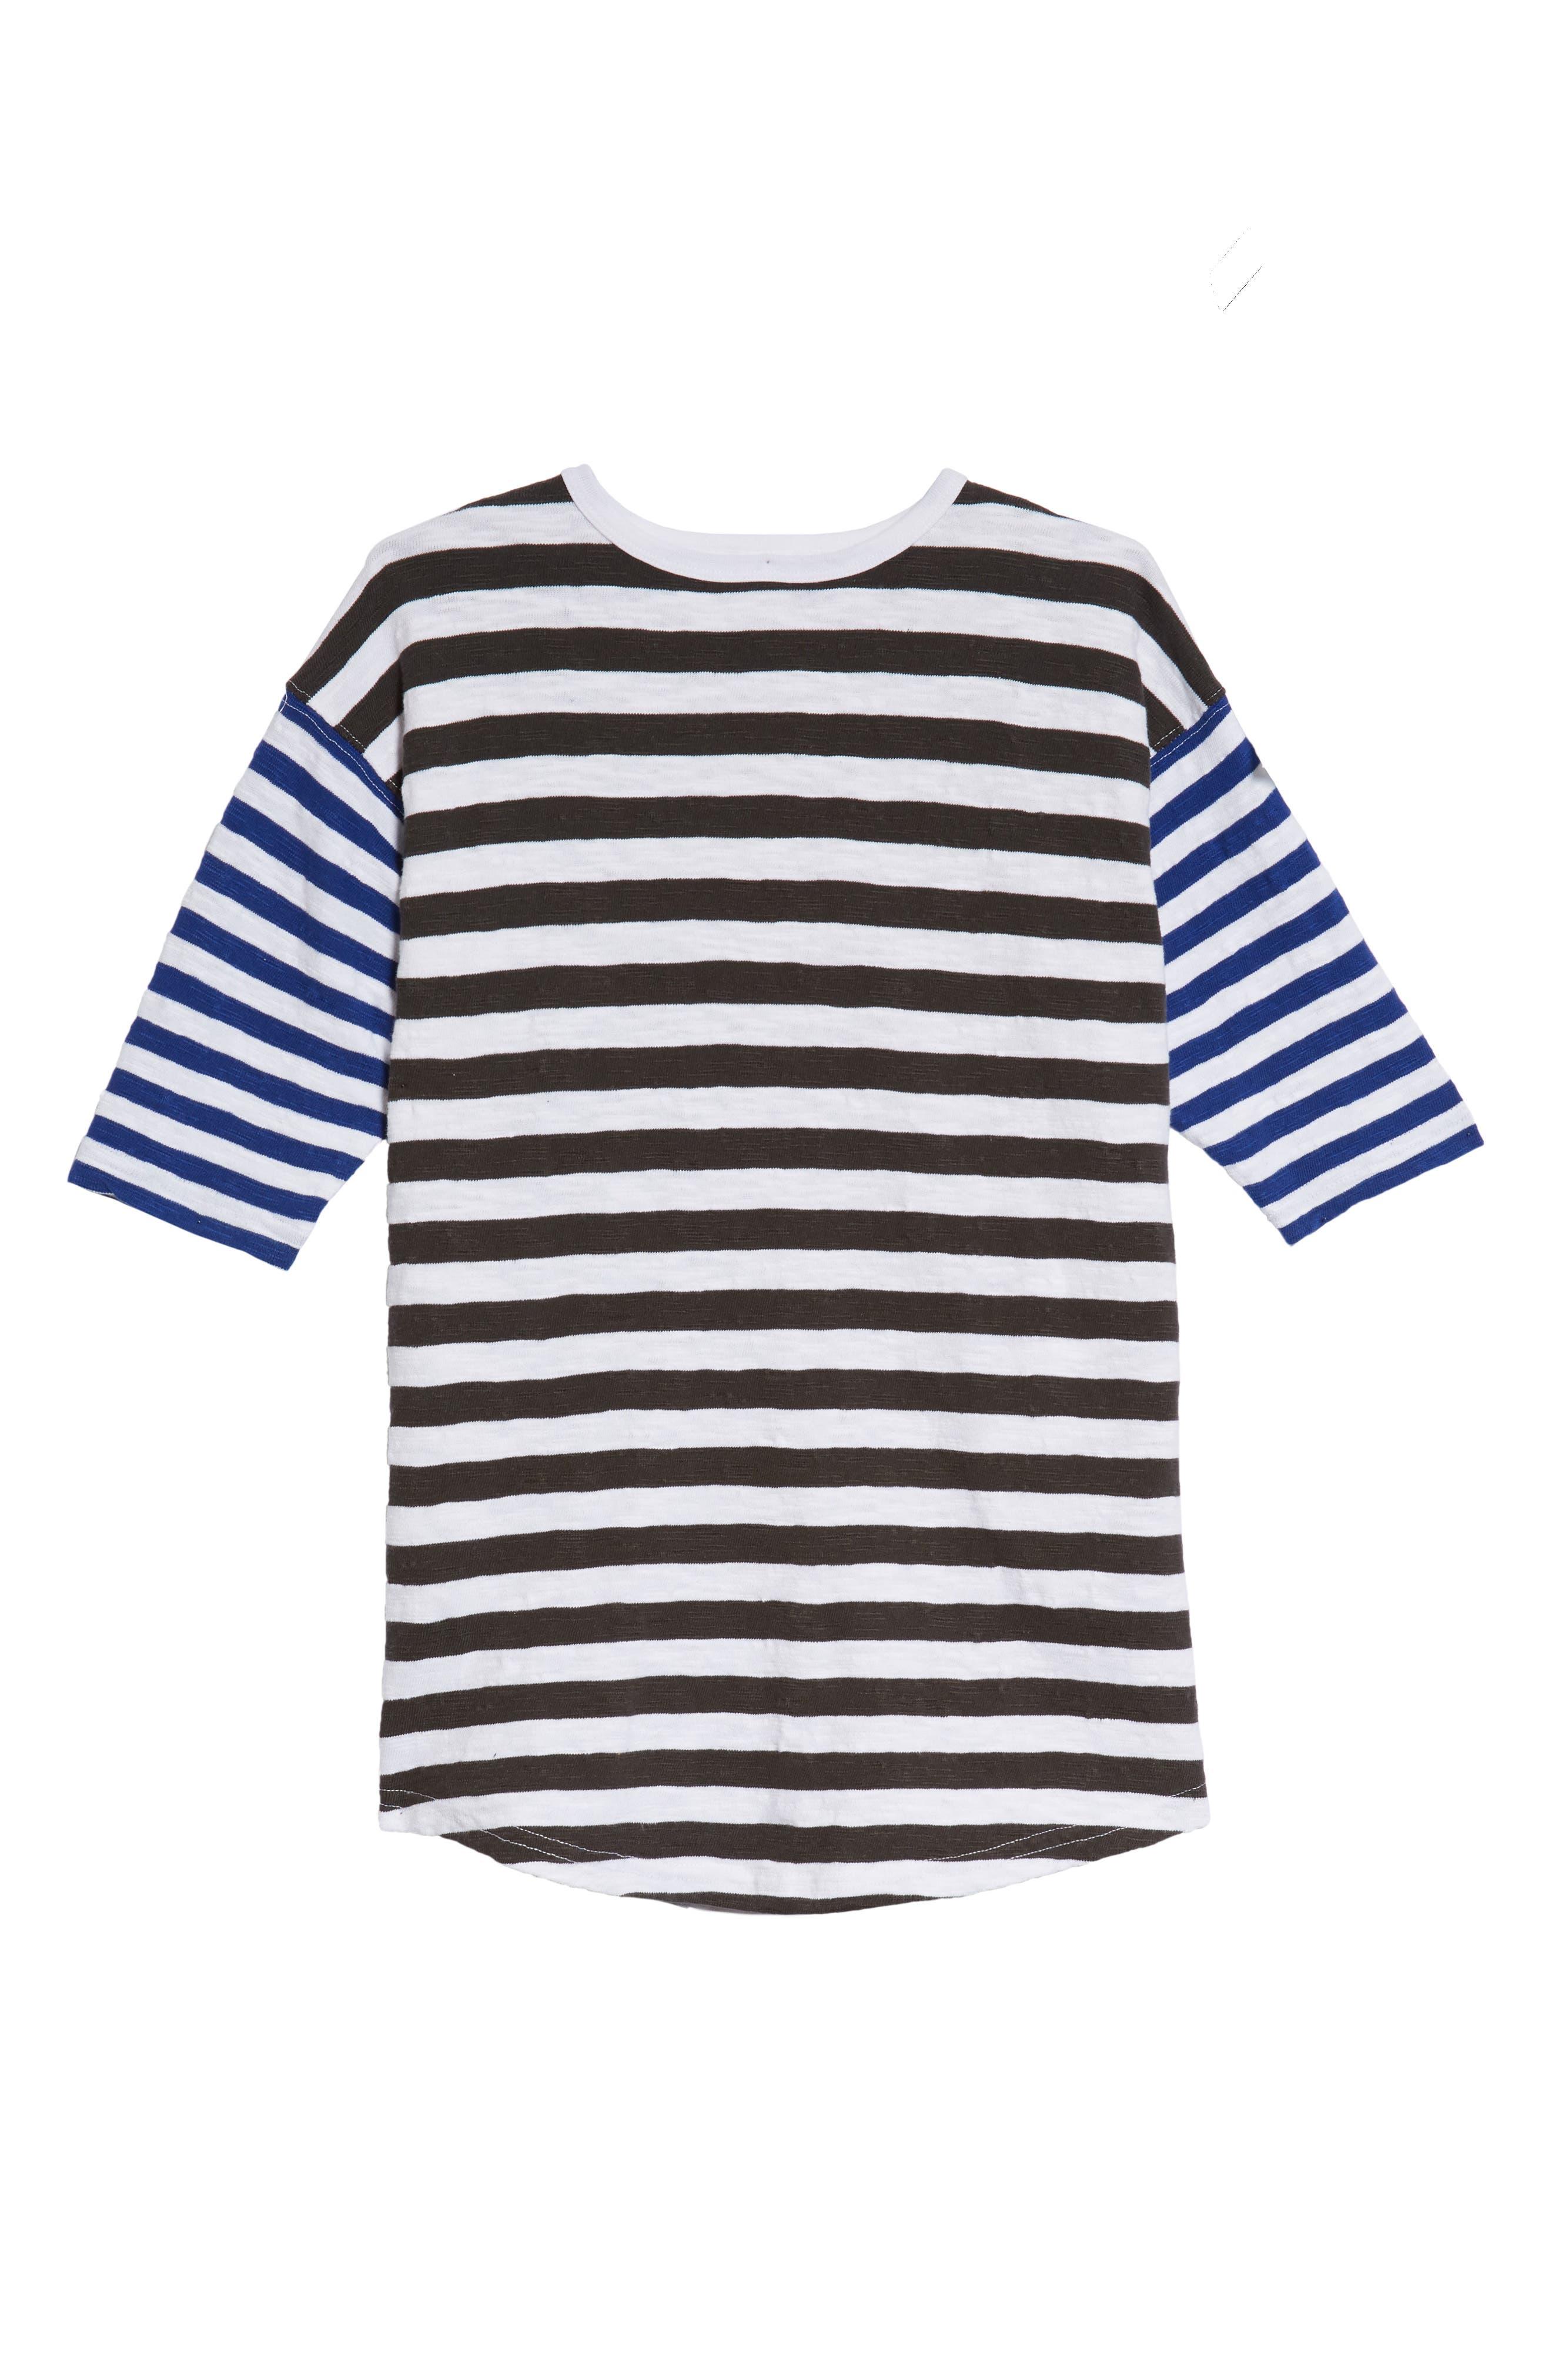 Mixed Stripe Dress,                         Main,                         color,